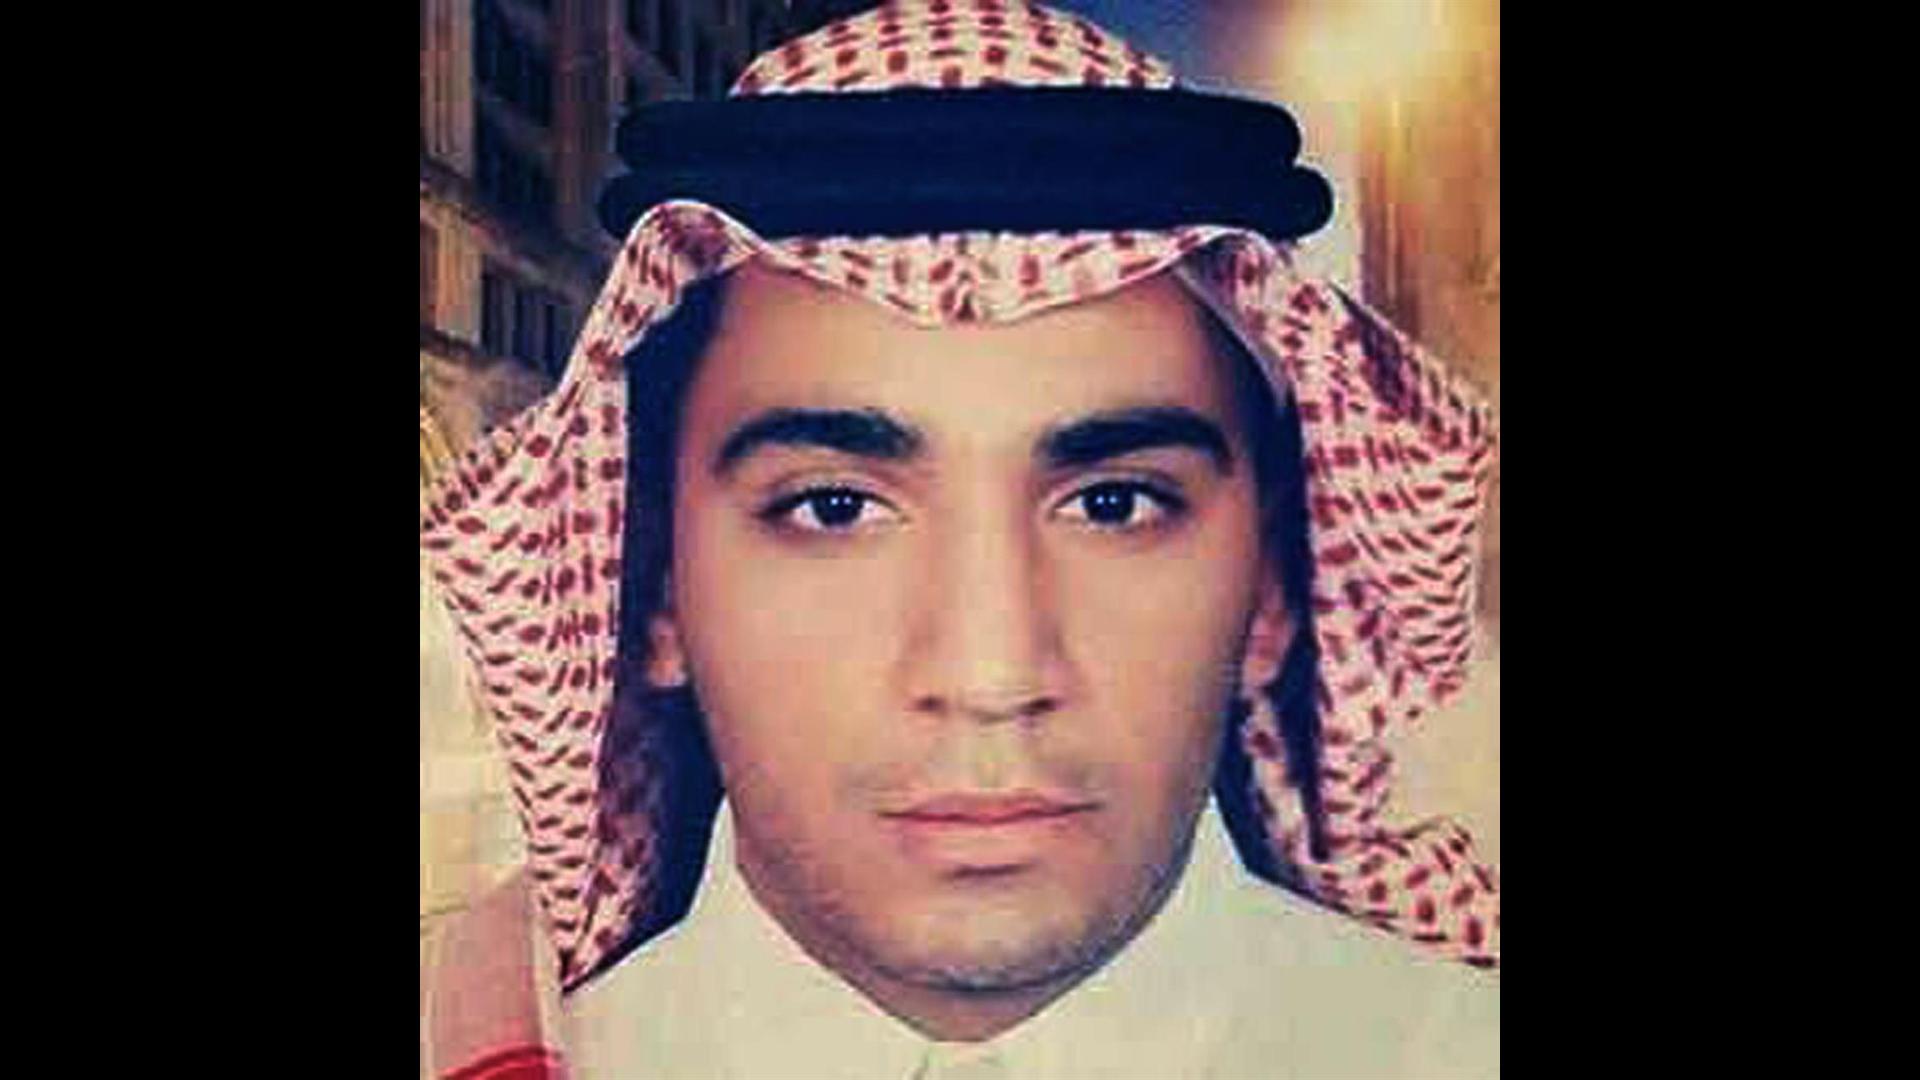 Mujtaba al-Sweikat 042319_1556066130003.jpg.jpg